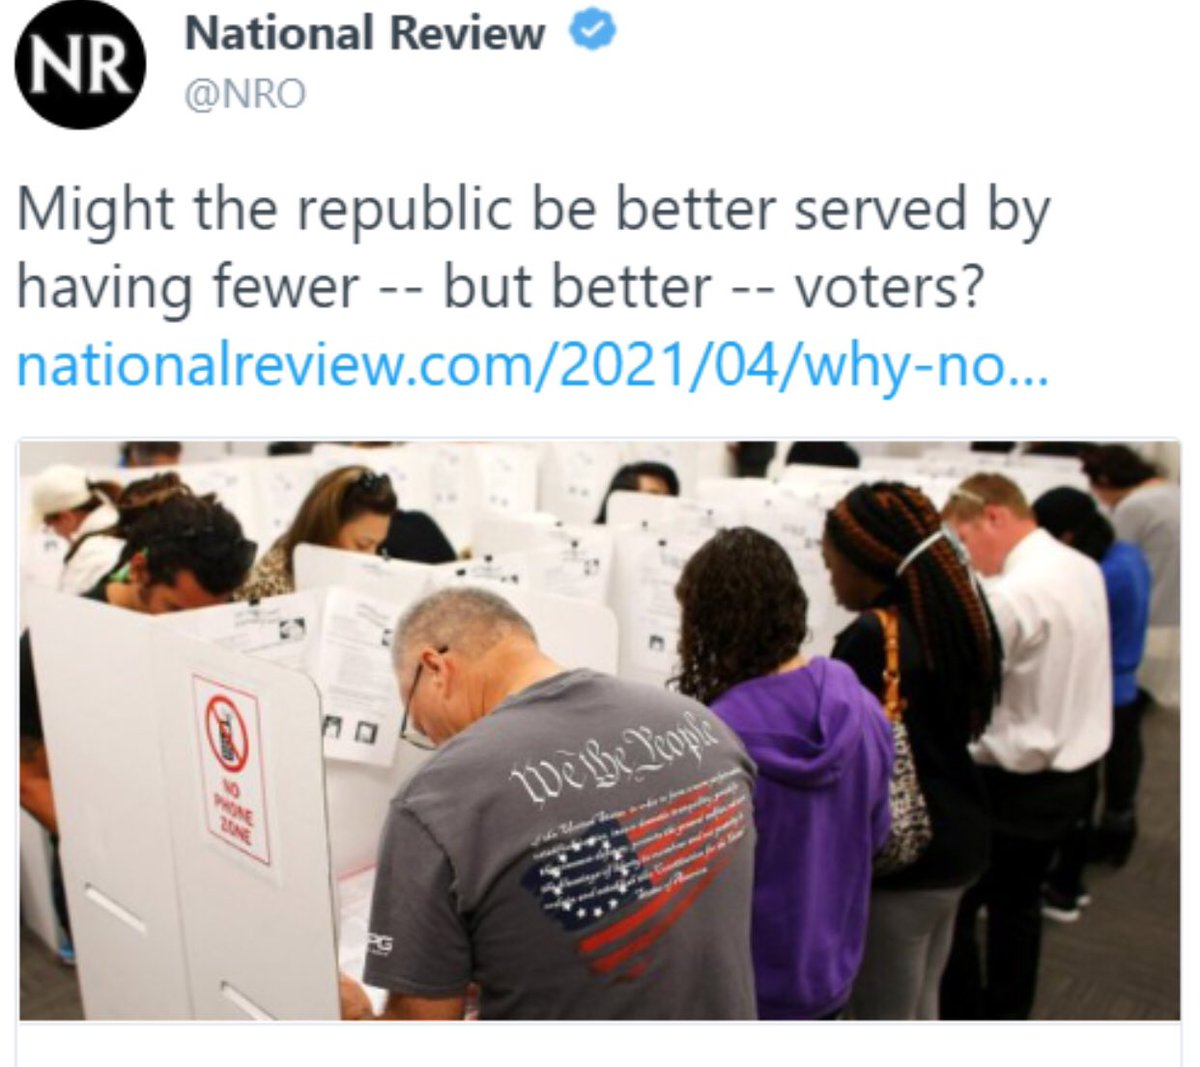 @AynRandPaulRyan's photo on National Review